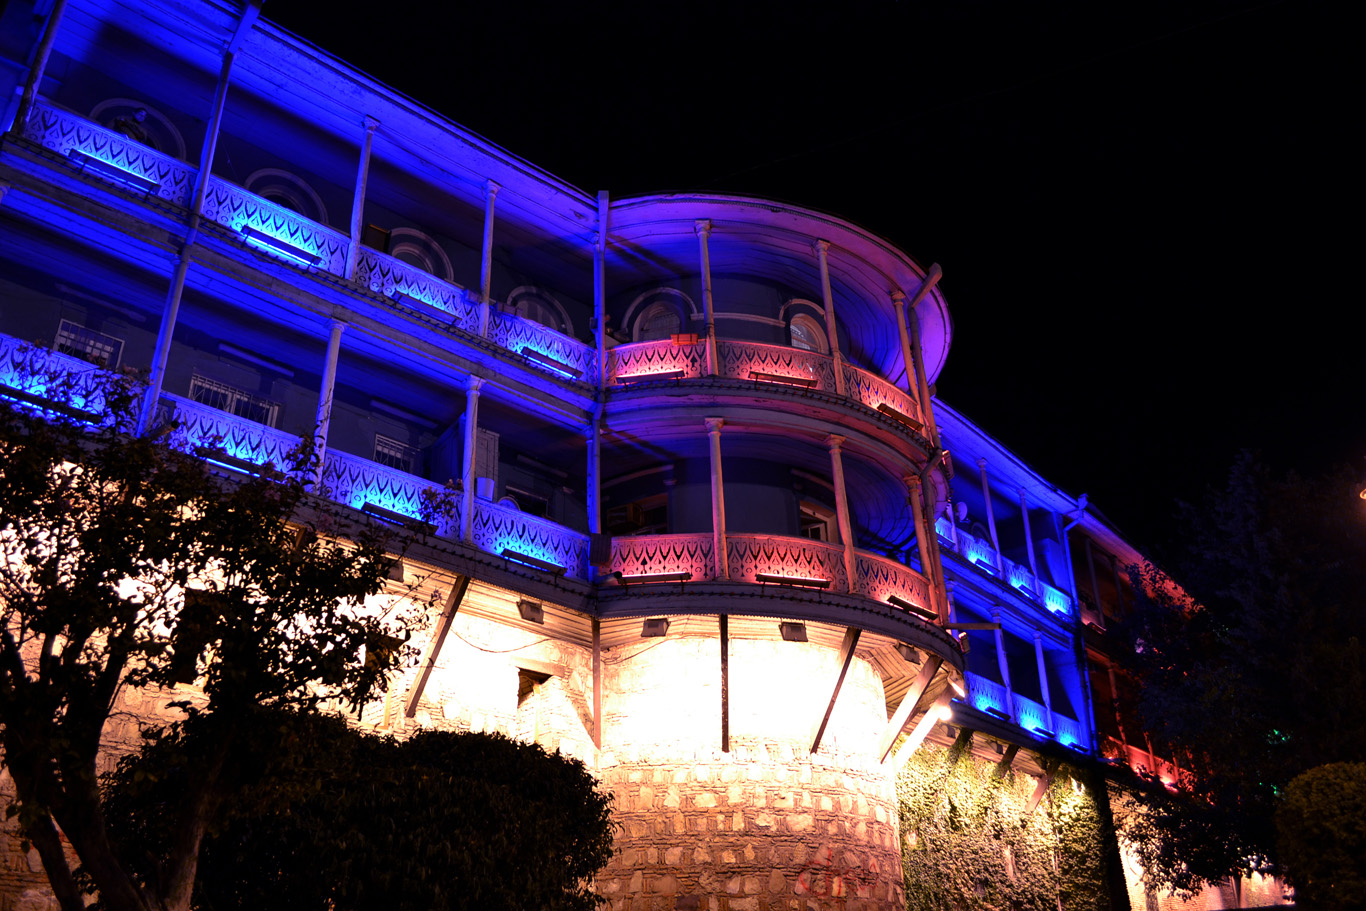 Balconies illuminated at night